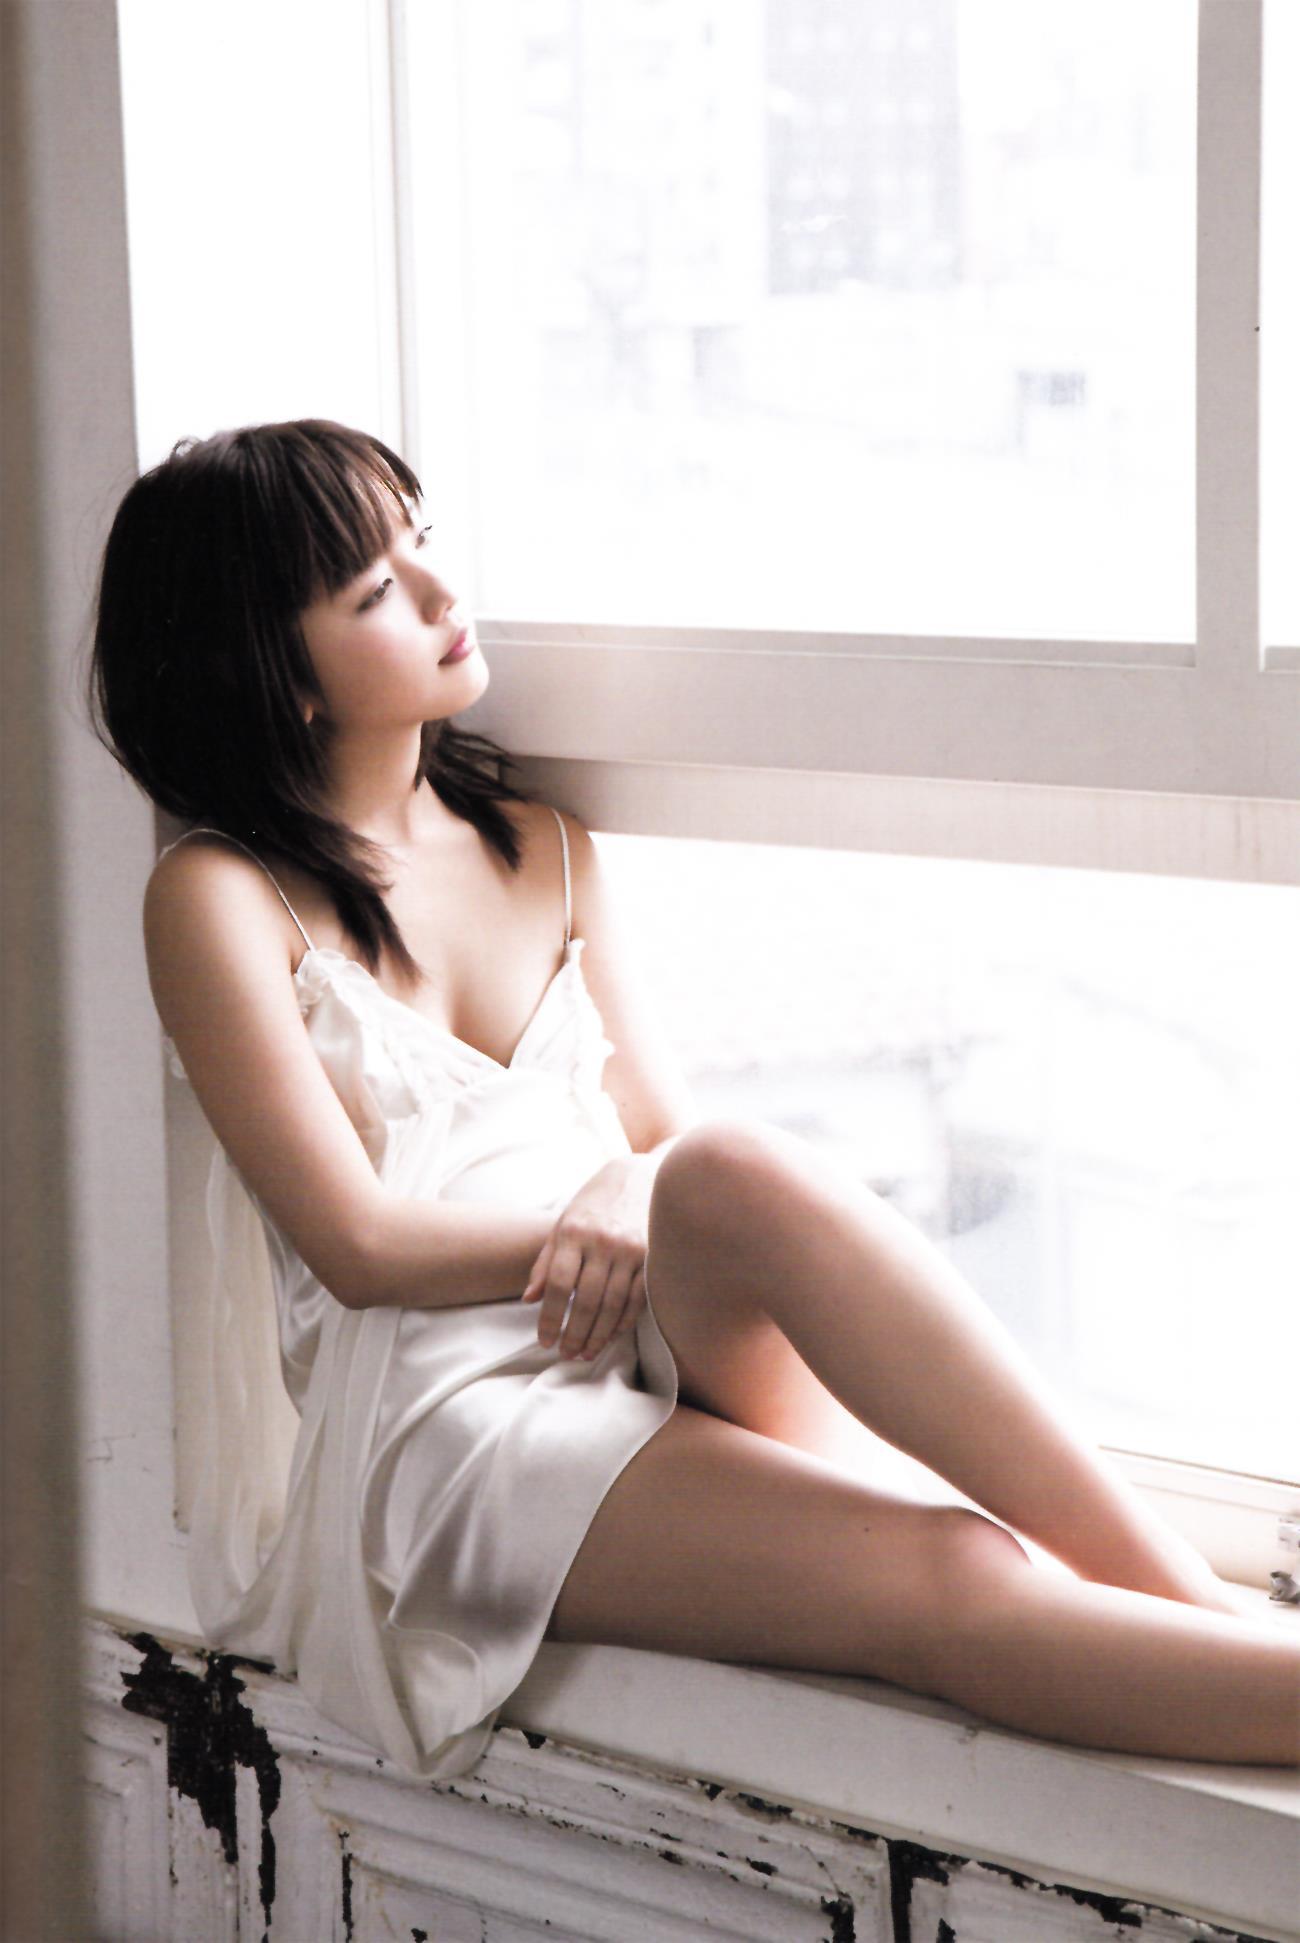 真野恵里菜 エロ画像 191